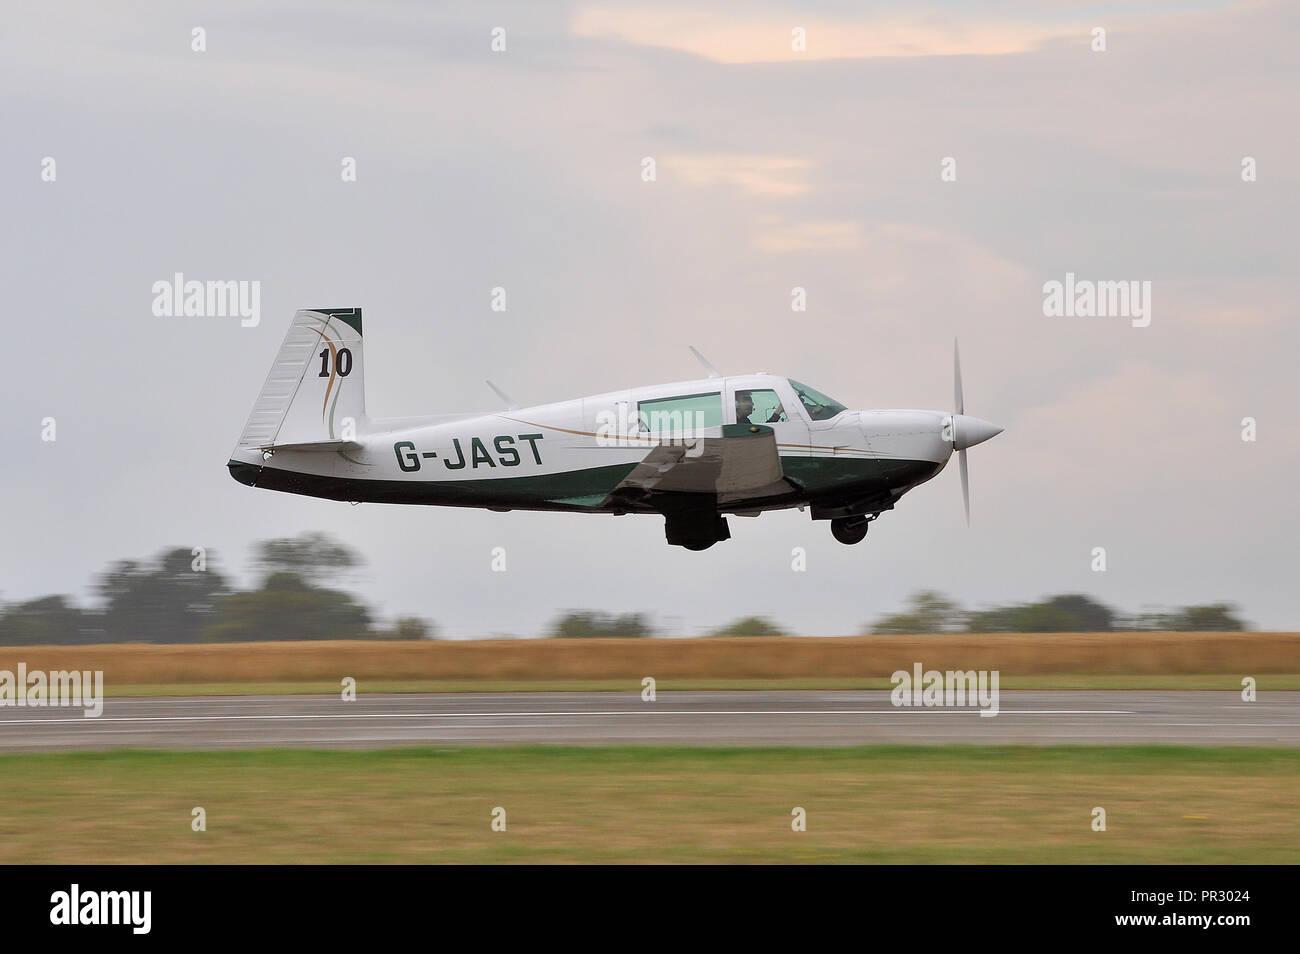 Mooney Aircraft Corporation Mooney M20J G-JAST 'Race 10' taking off for Royal Aero Club Air Race at Sywell Aerodrome. Michael Willis pilot - Stock Image